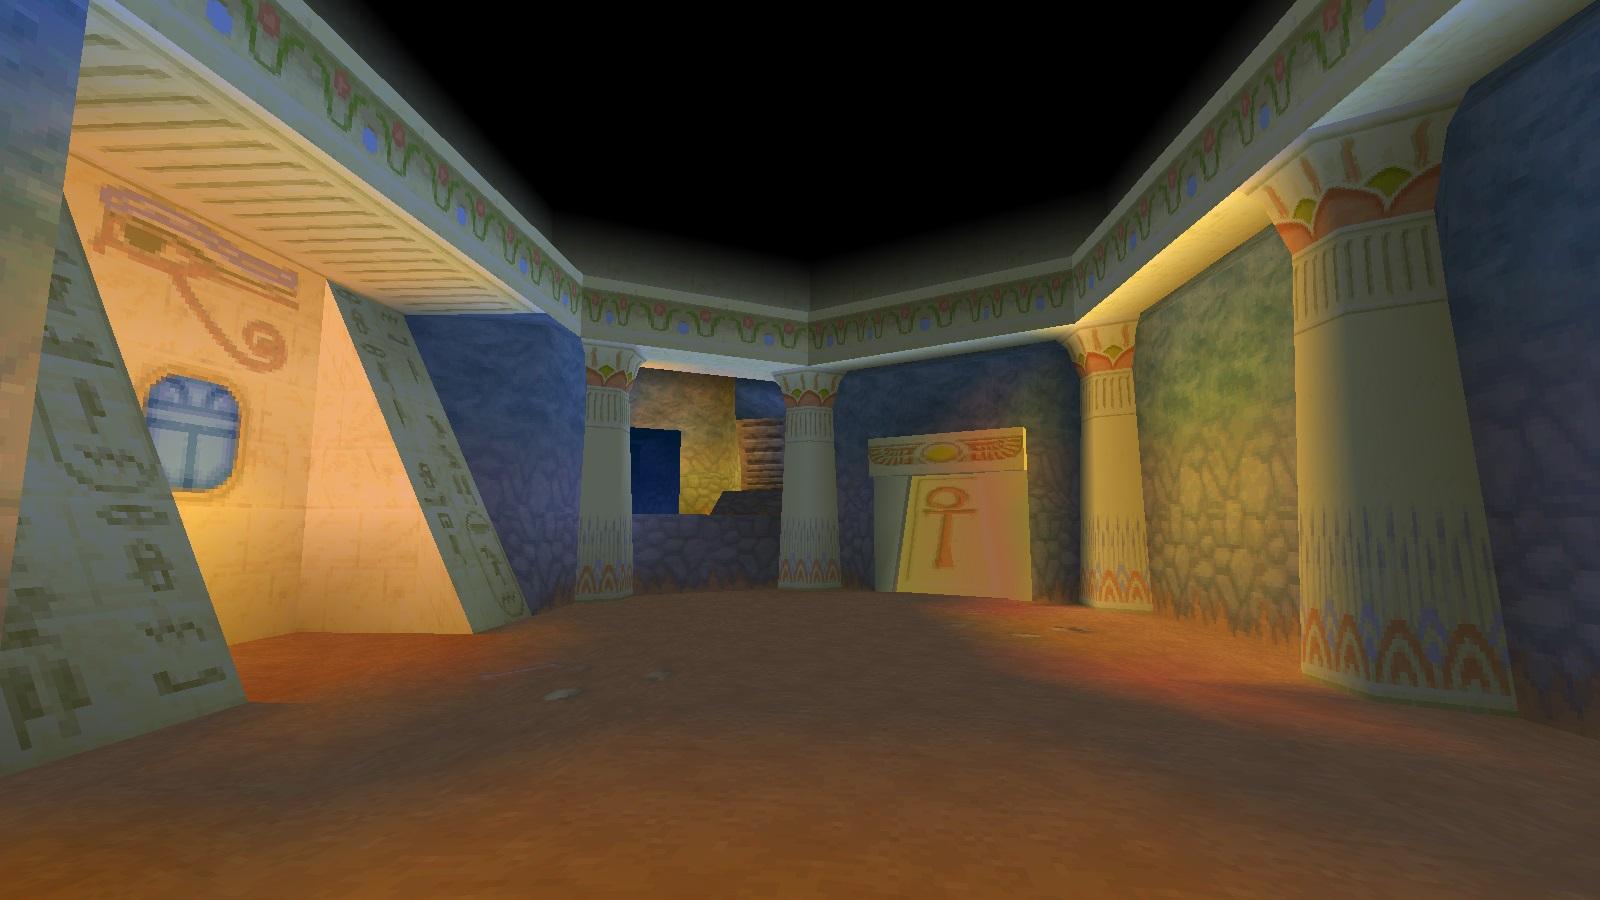 Haunted_tomb.jpg